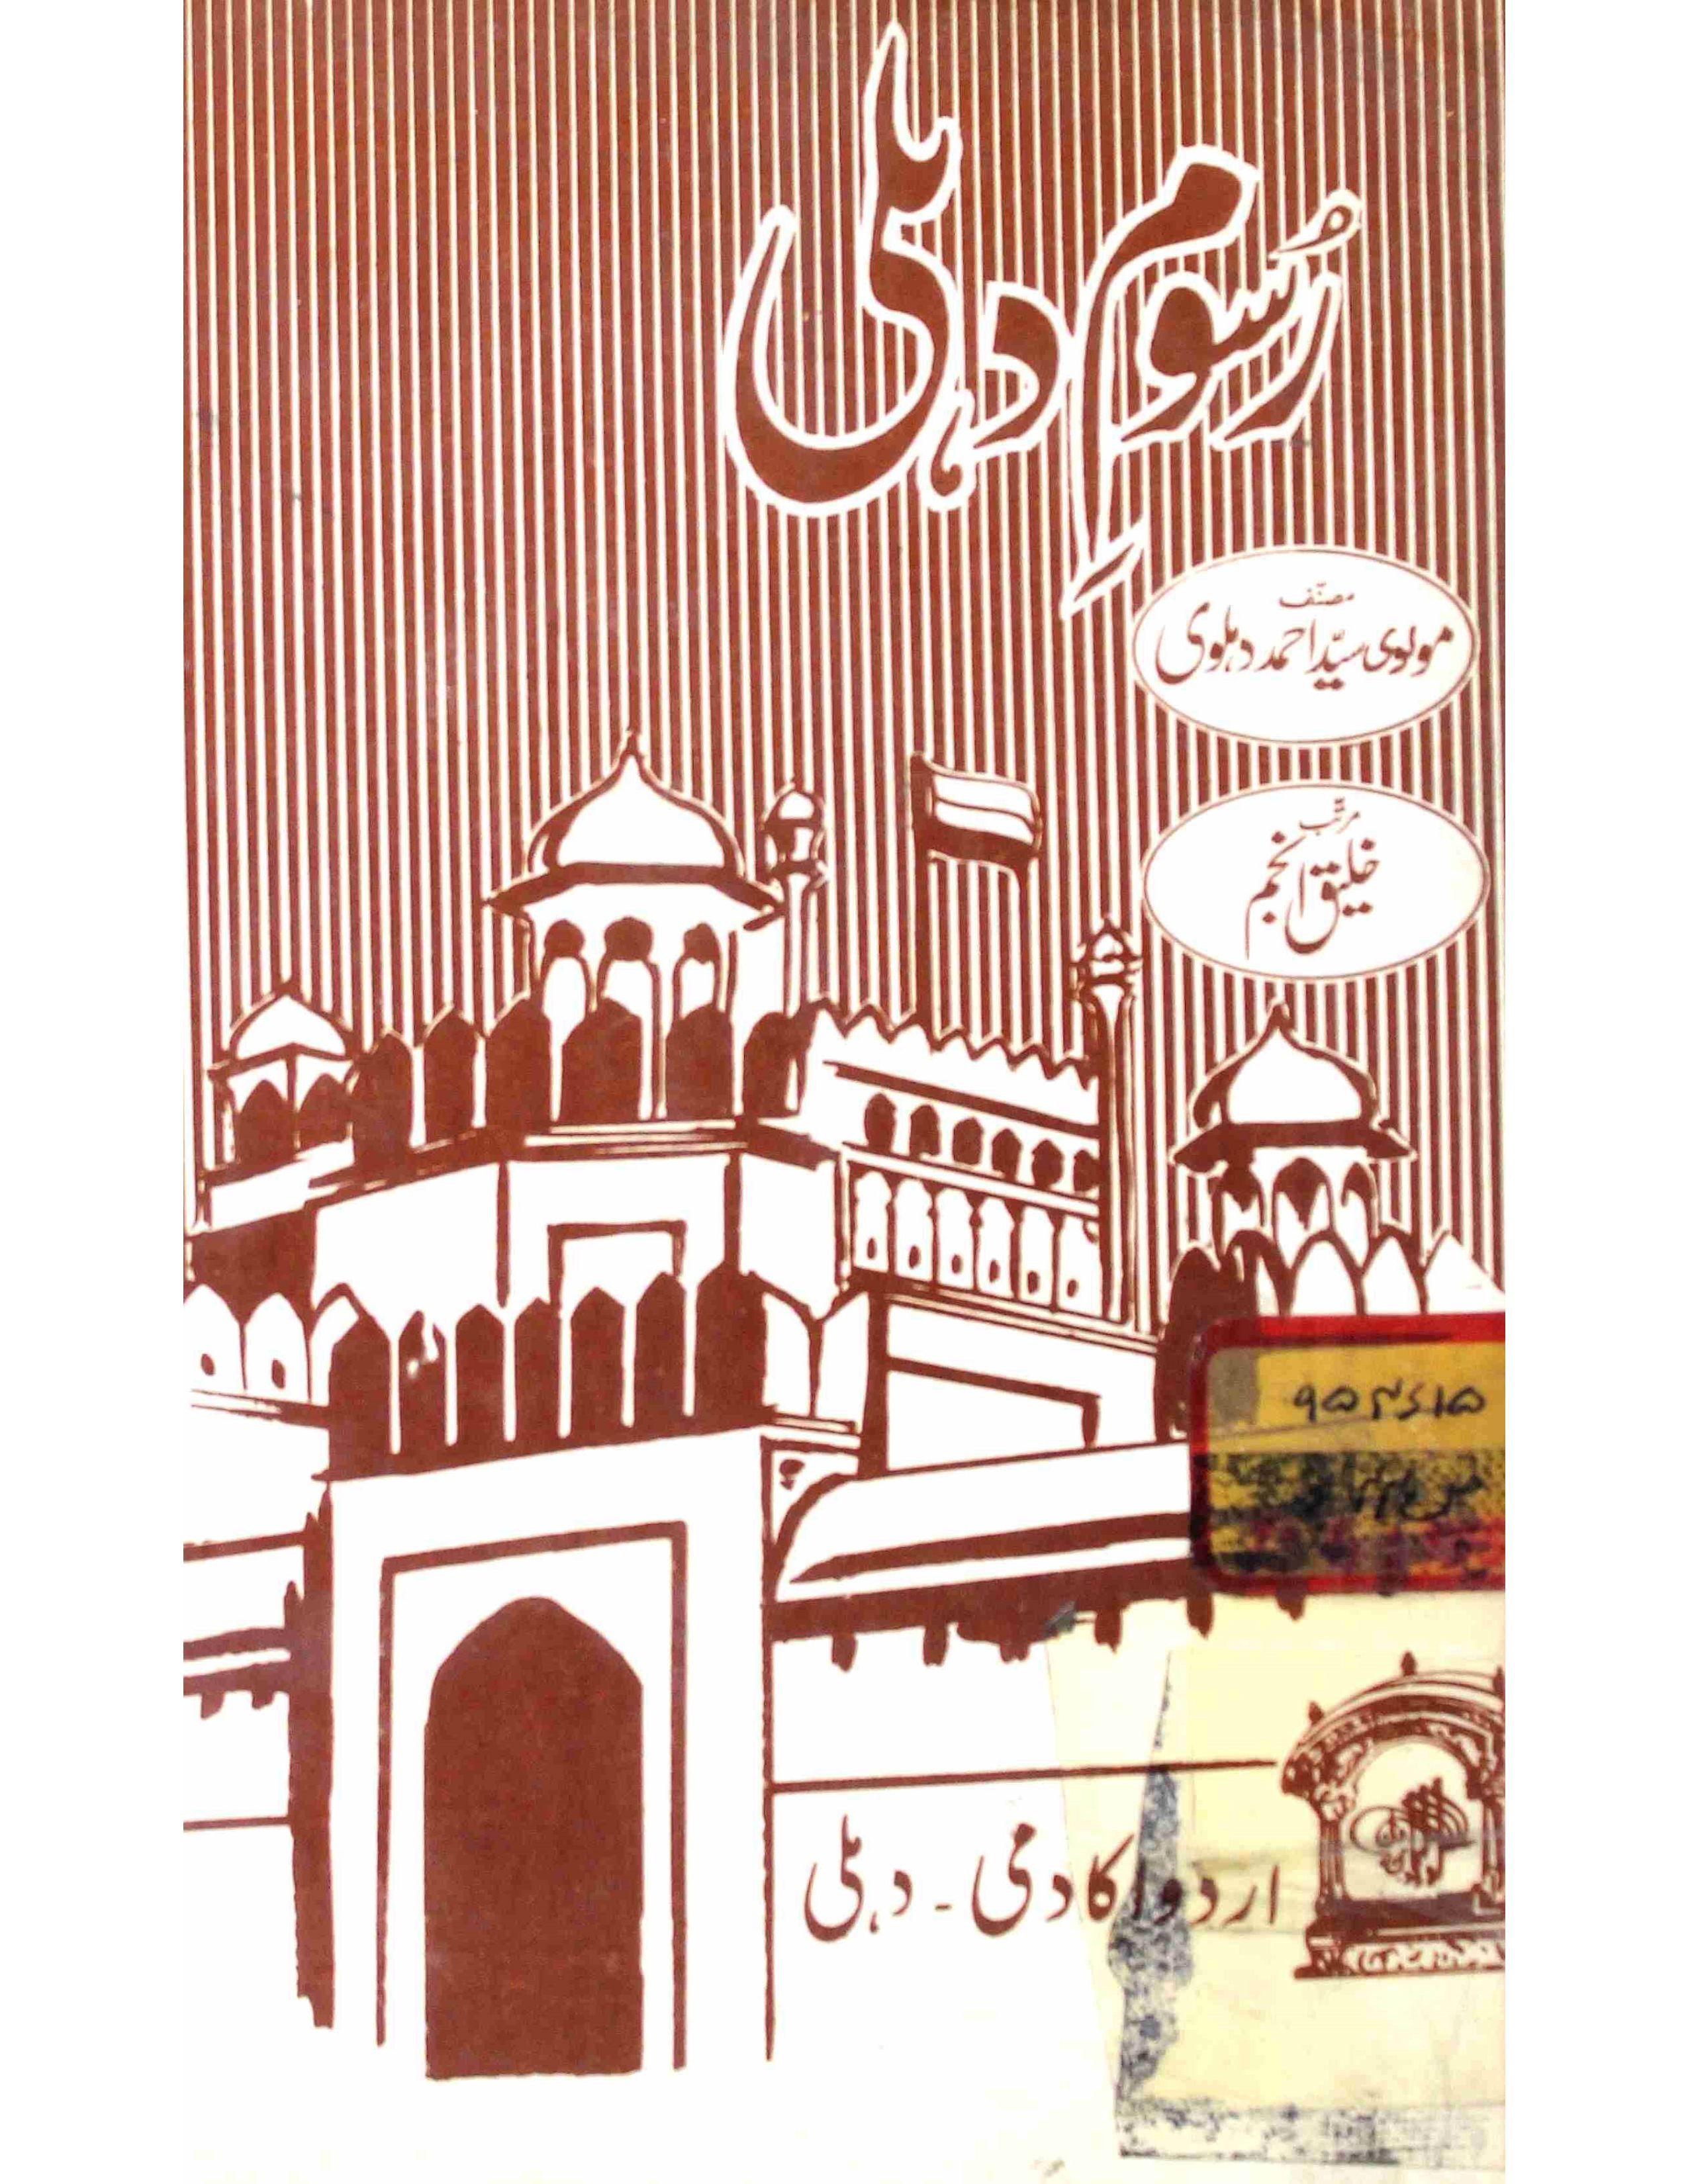 Rusoom-e-Delhi